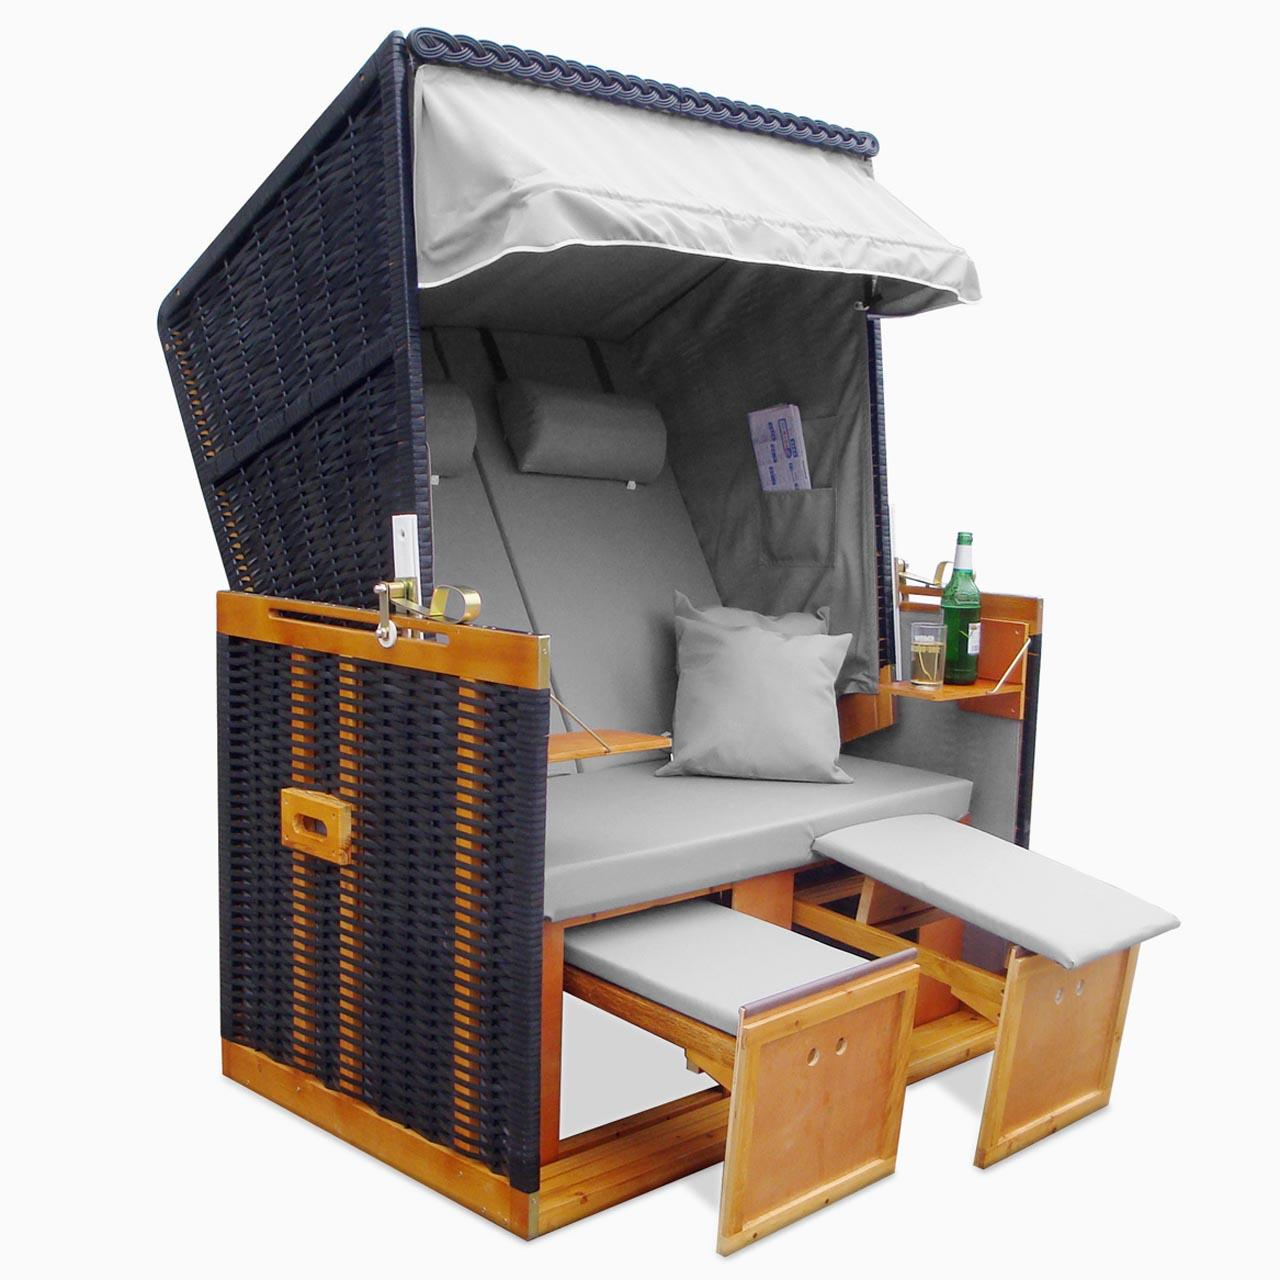 strandkorb wyk nweide rugbyclubeemland. Black Bedroom Furniture Sets. Home Design Ideas